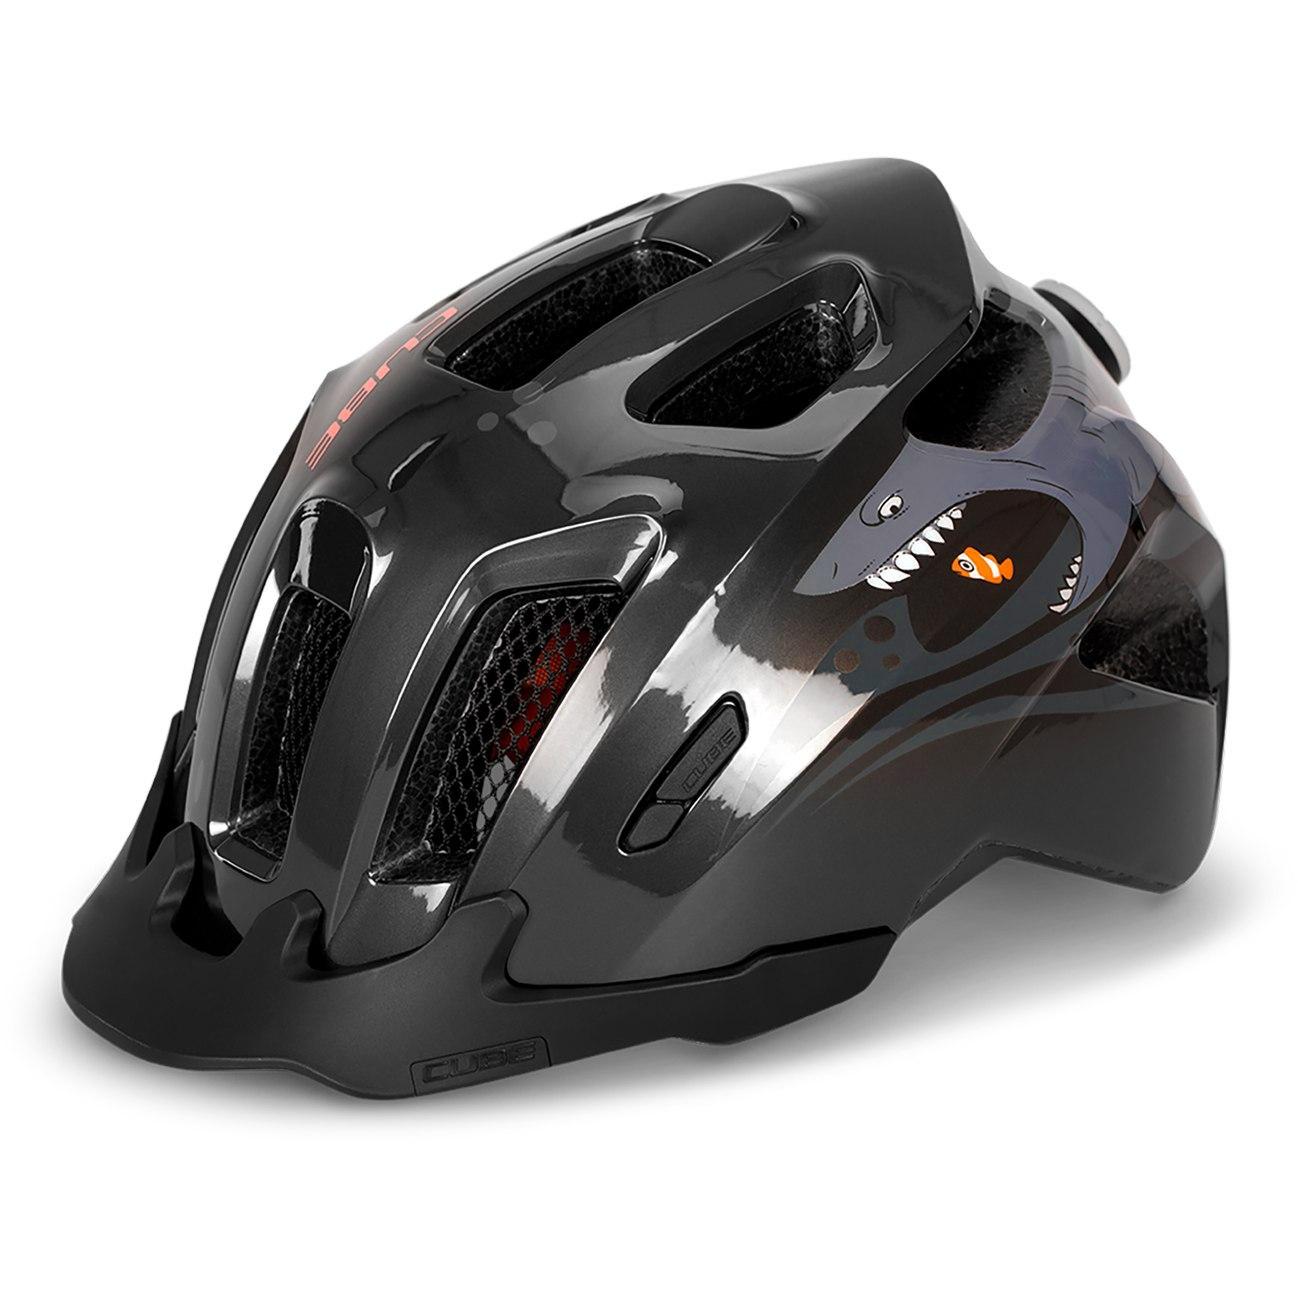 CUBE Helmet ANT - black